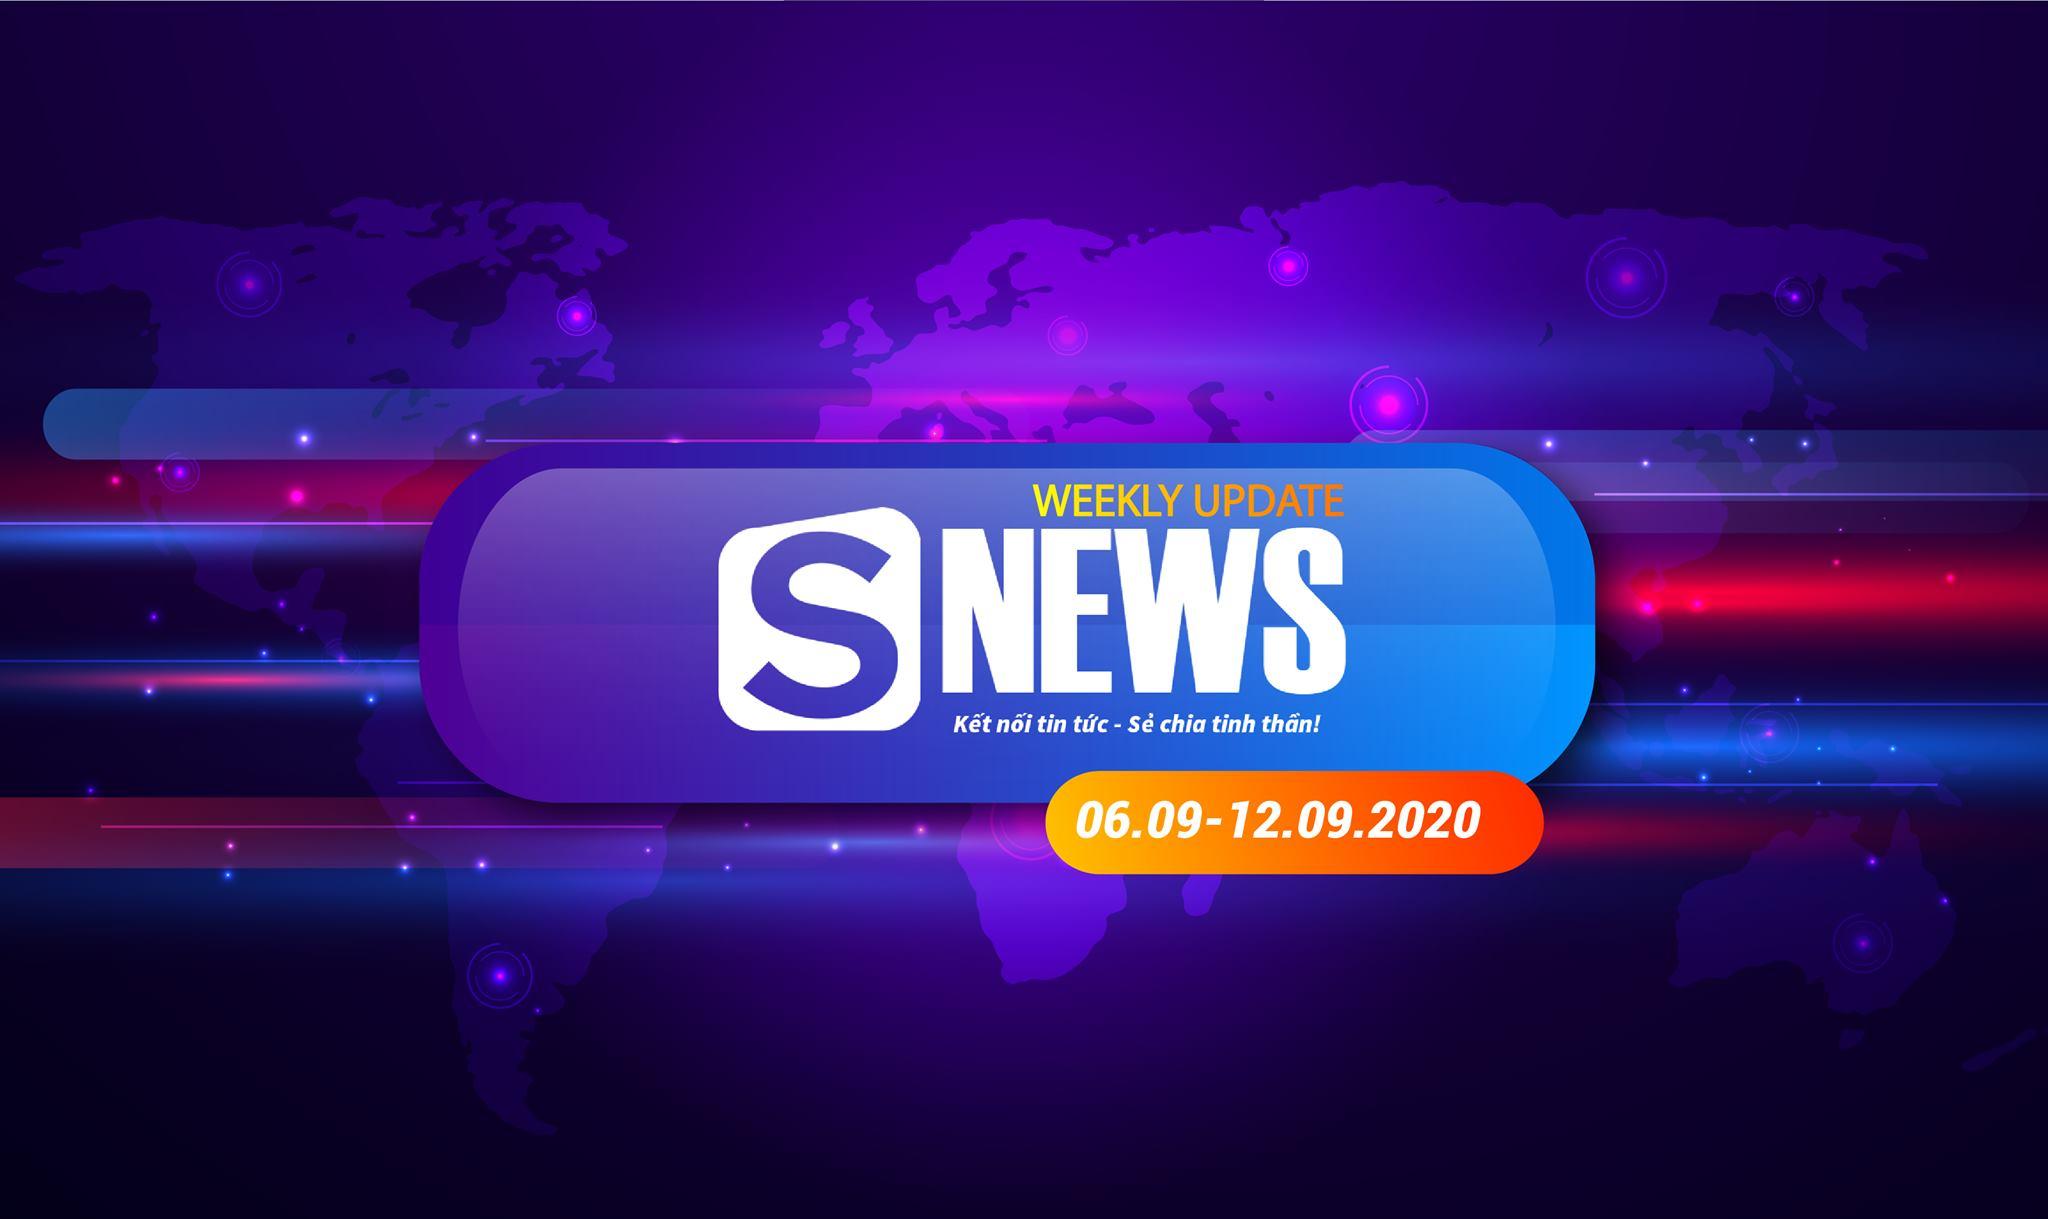 Tổng hợp tin tức Sapo tuần qua: 06.09 - 12.09